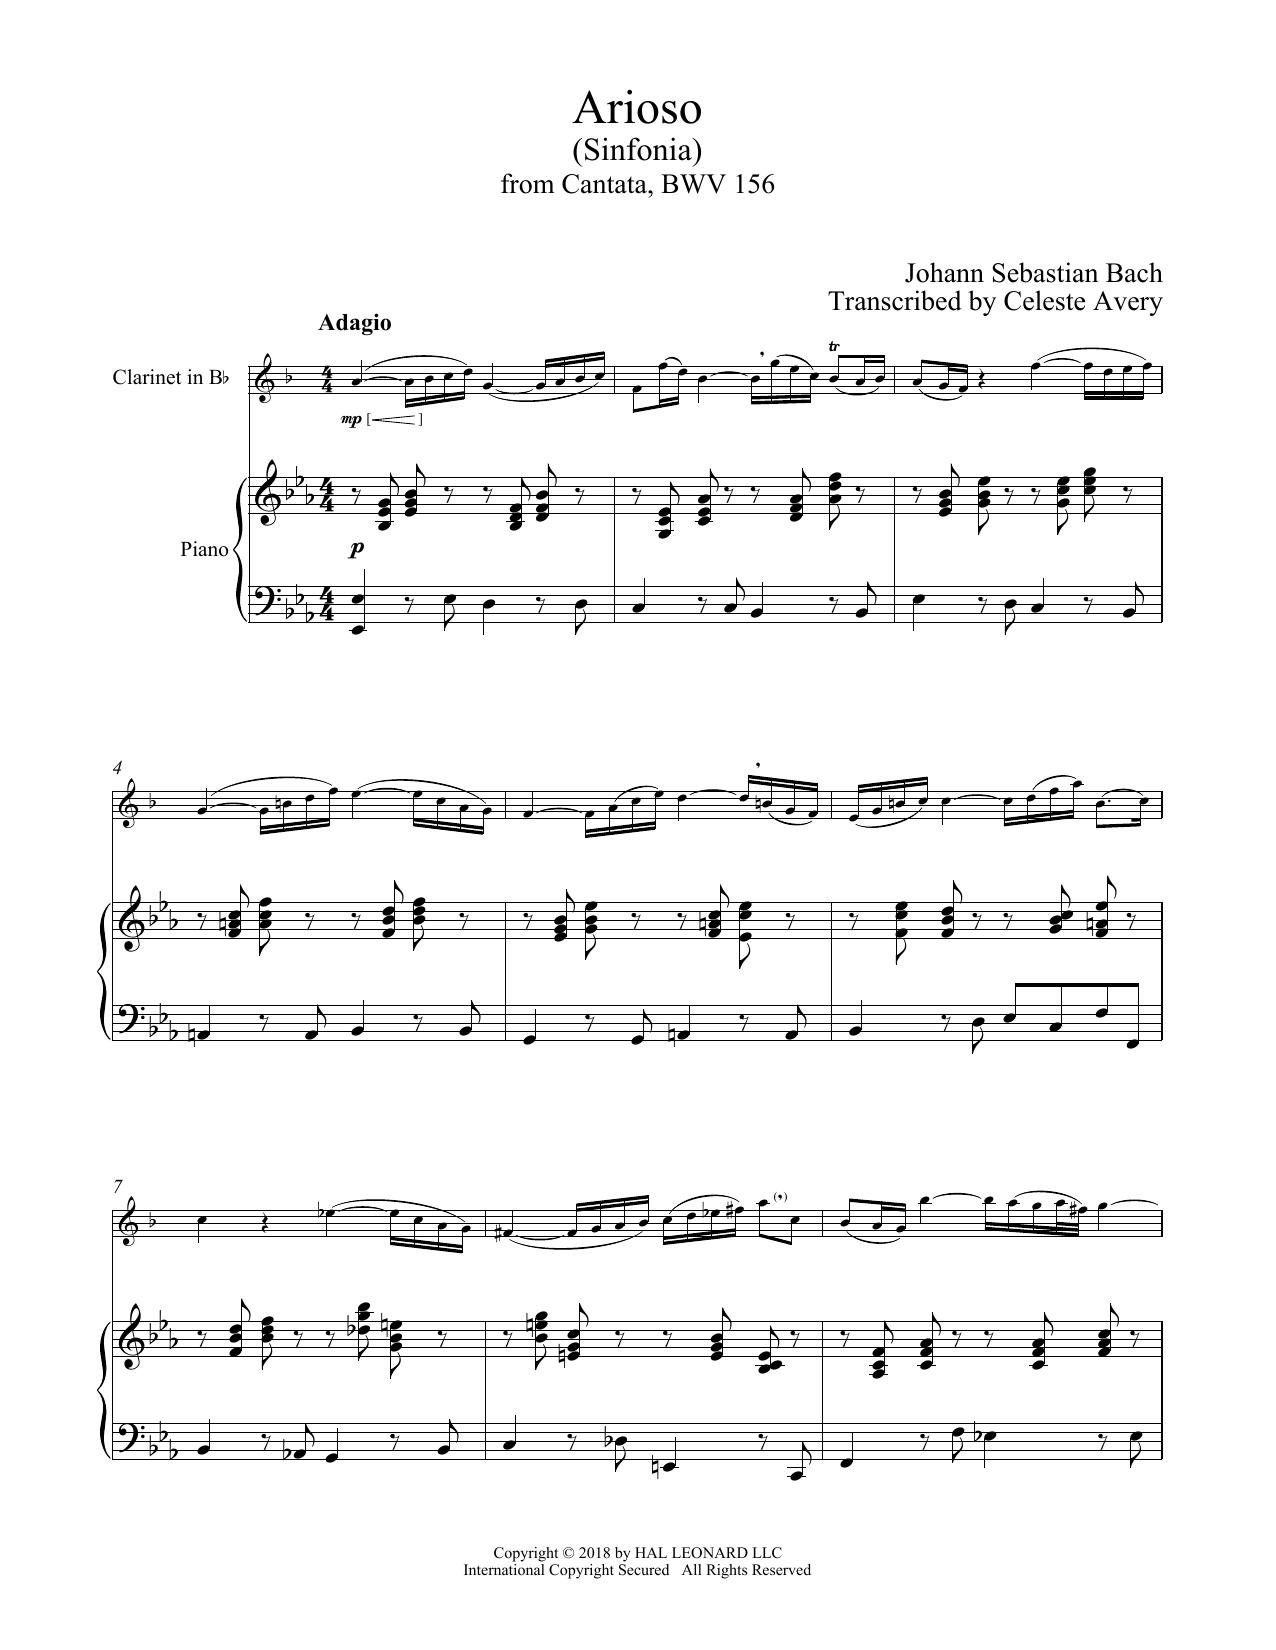 Arioso (Clarinet and Piano)